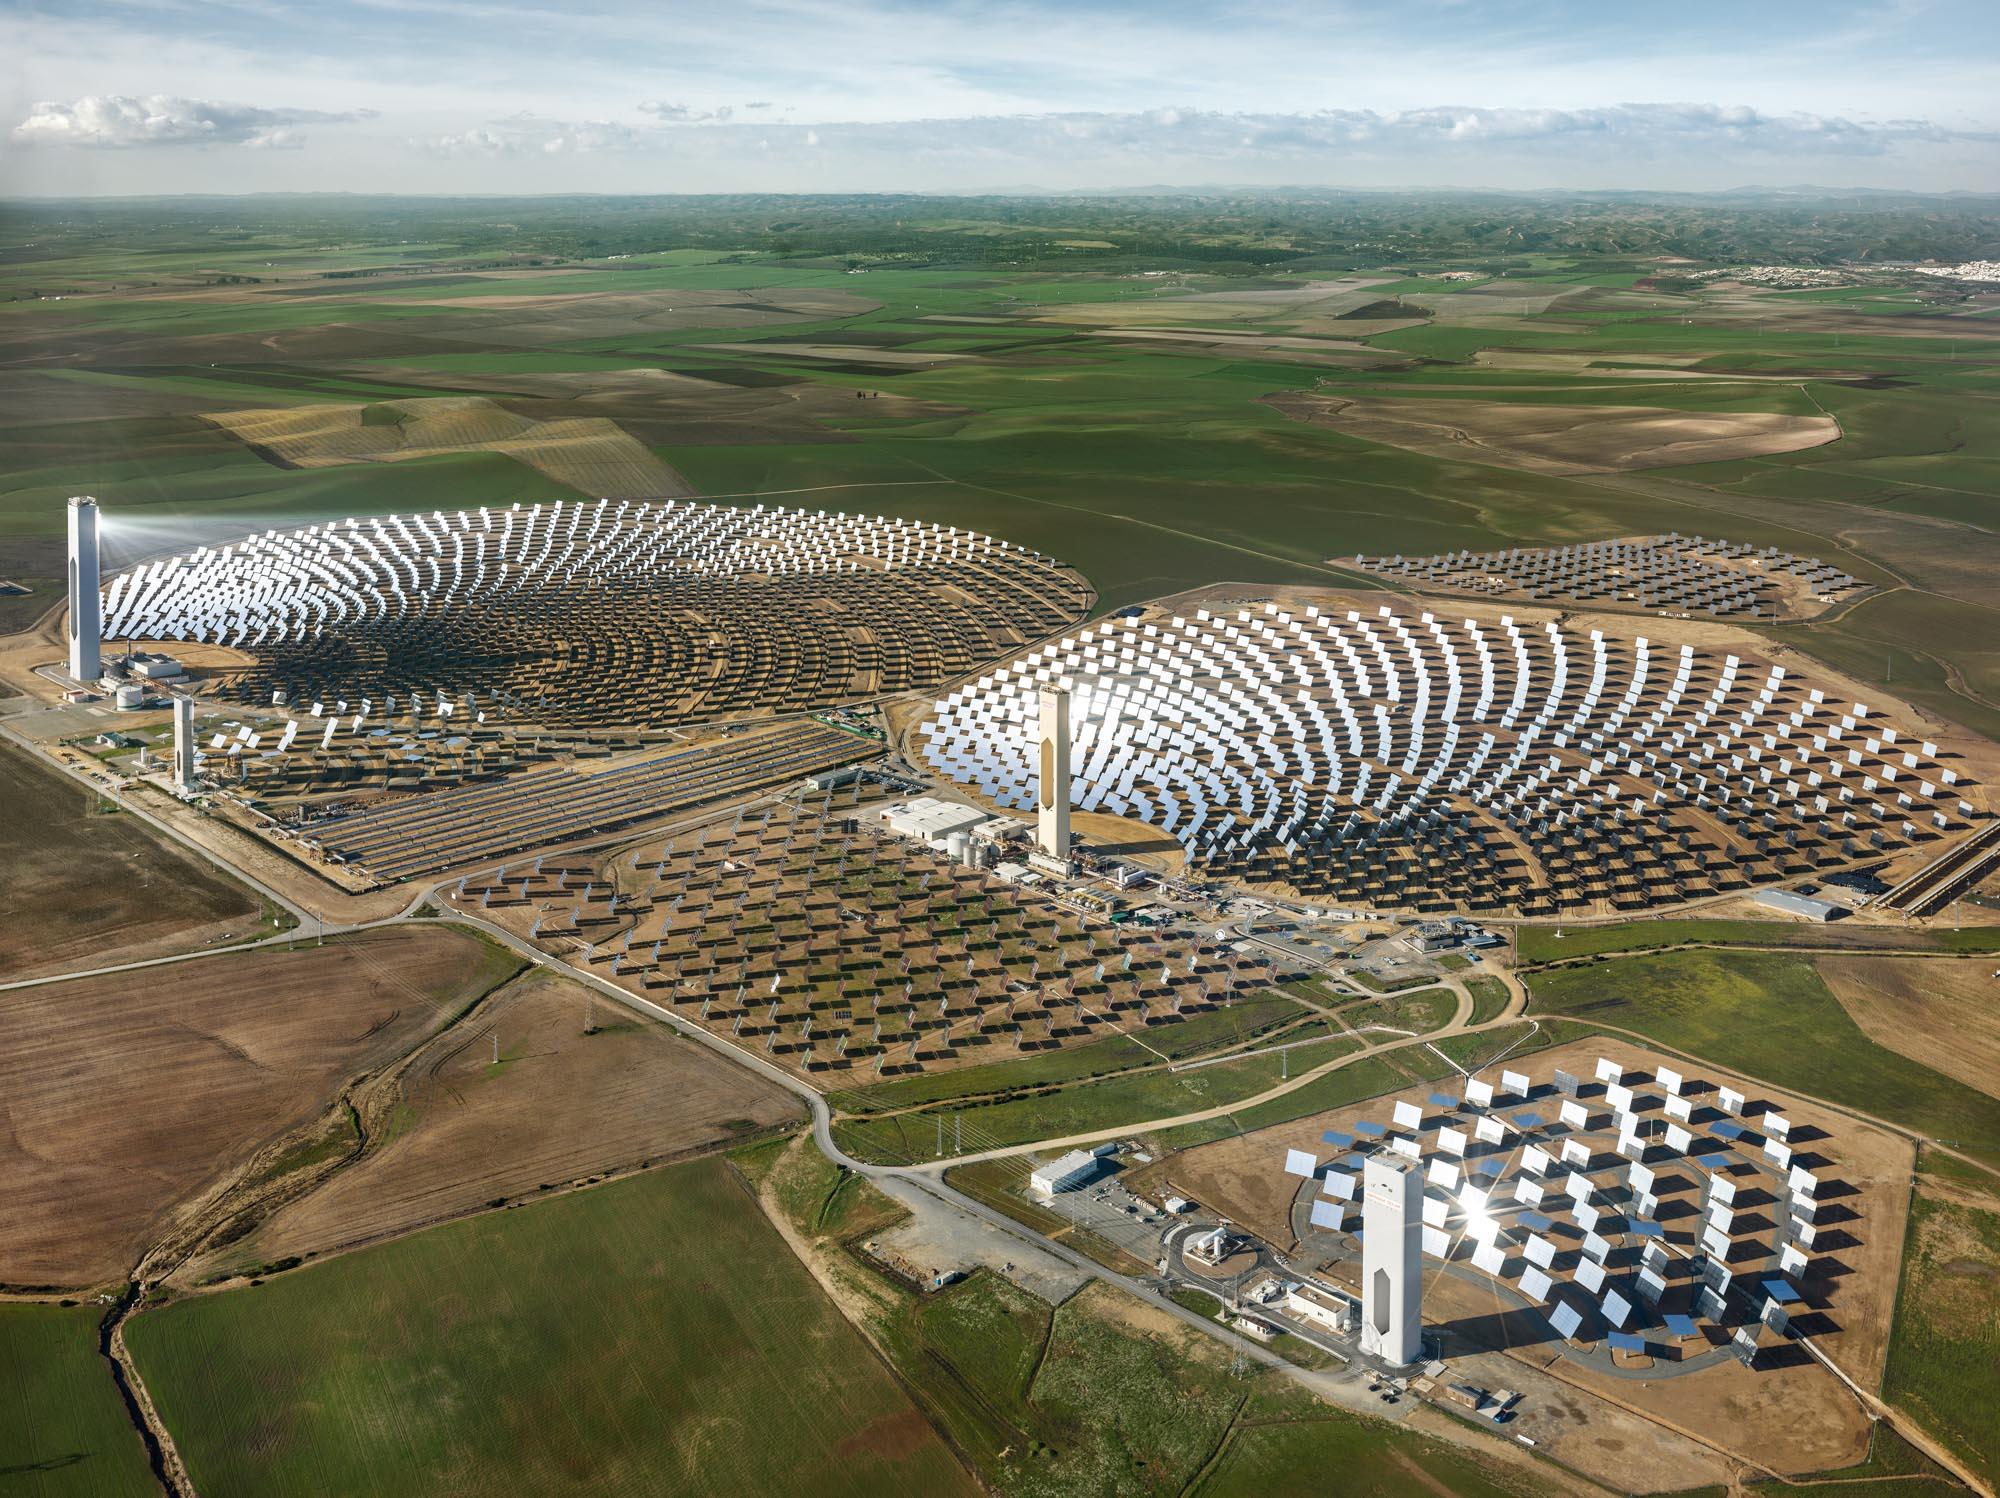 Edward Burtynsky, Anthropocene - Fondazione MAST PS10 Solar Power Plant, Seville, Spain 2013 Foto © Edward Burtynsky, cortesia Admira Photography, Milano ' Nicholas Metivier Gallery, Toronto